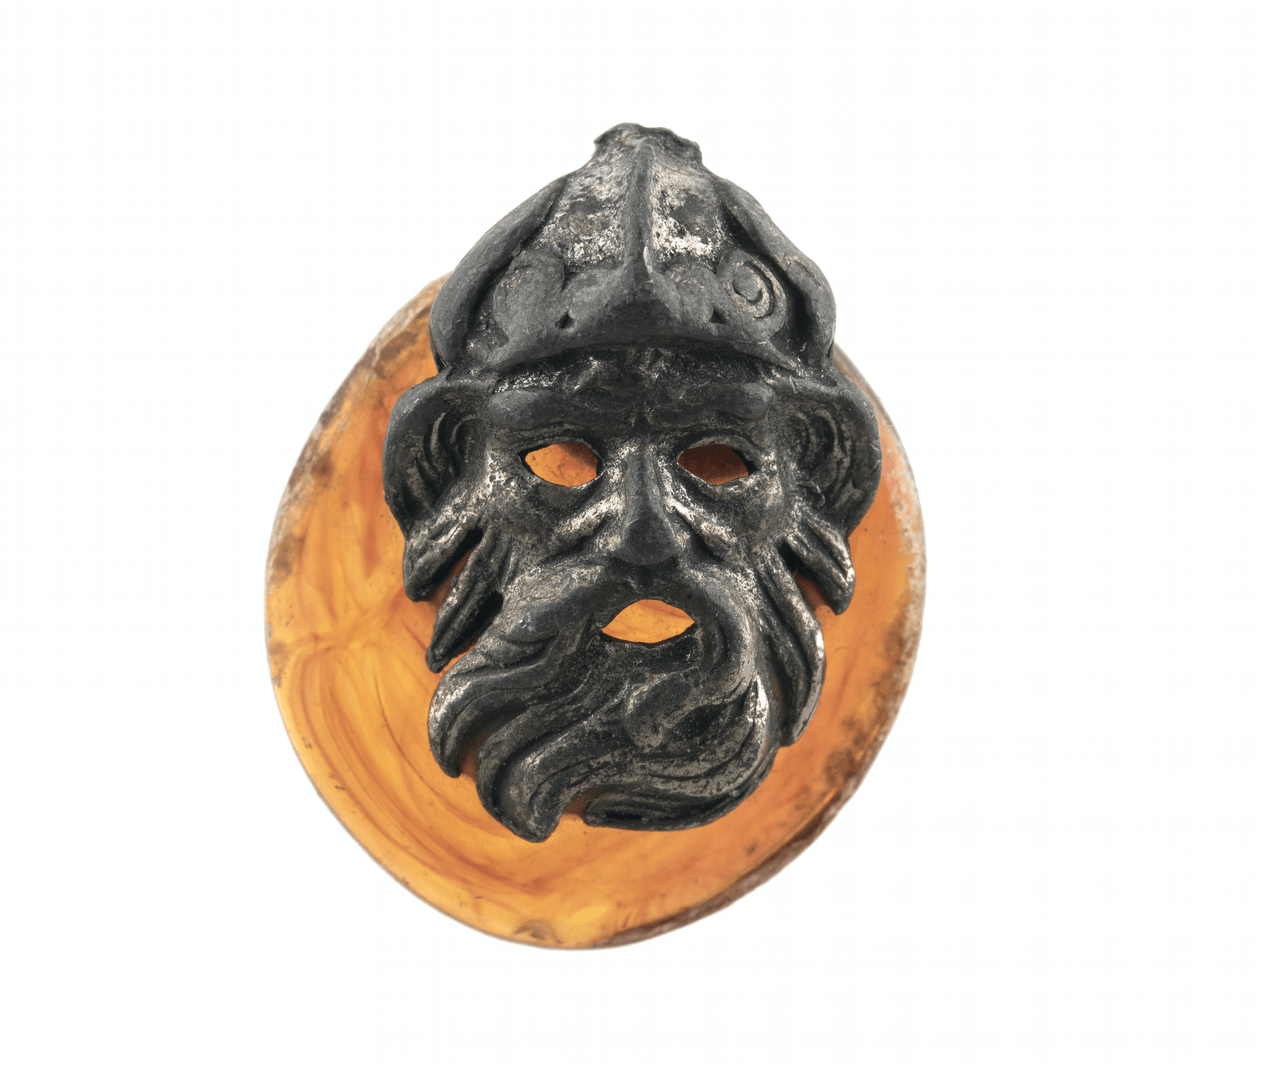 An Antique Mounted Pendant of Zeus